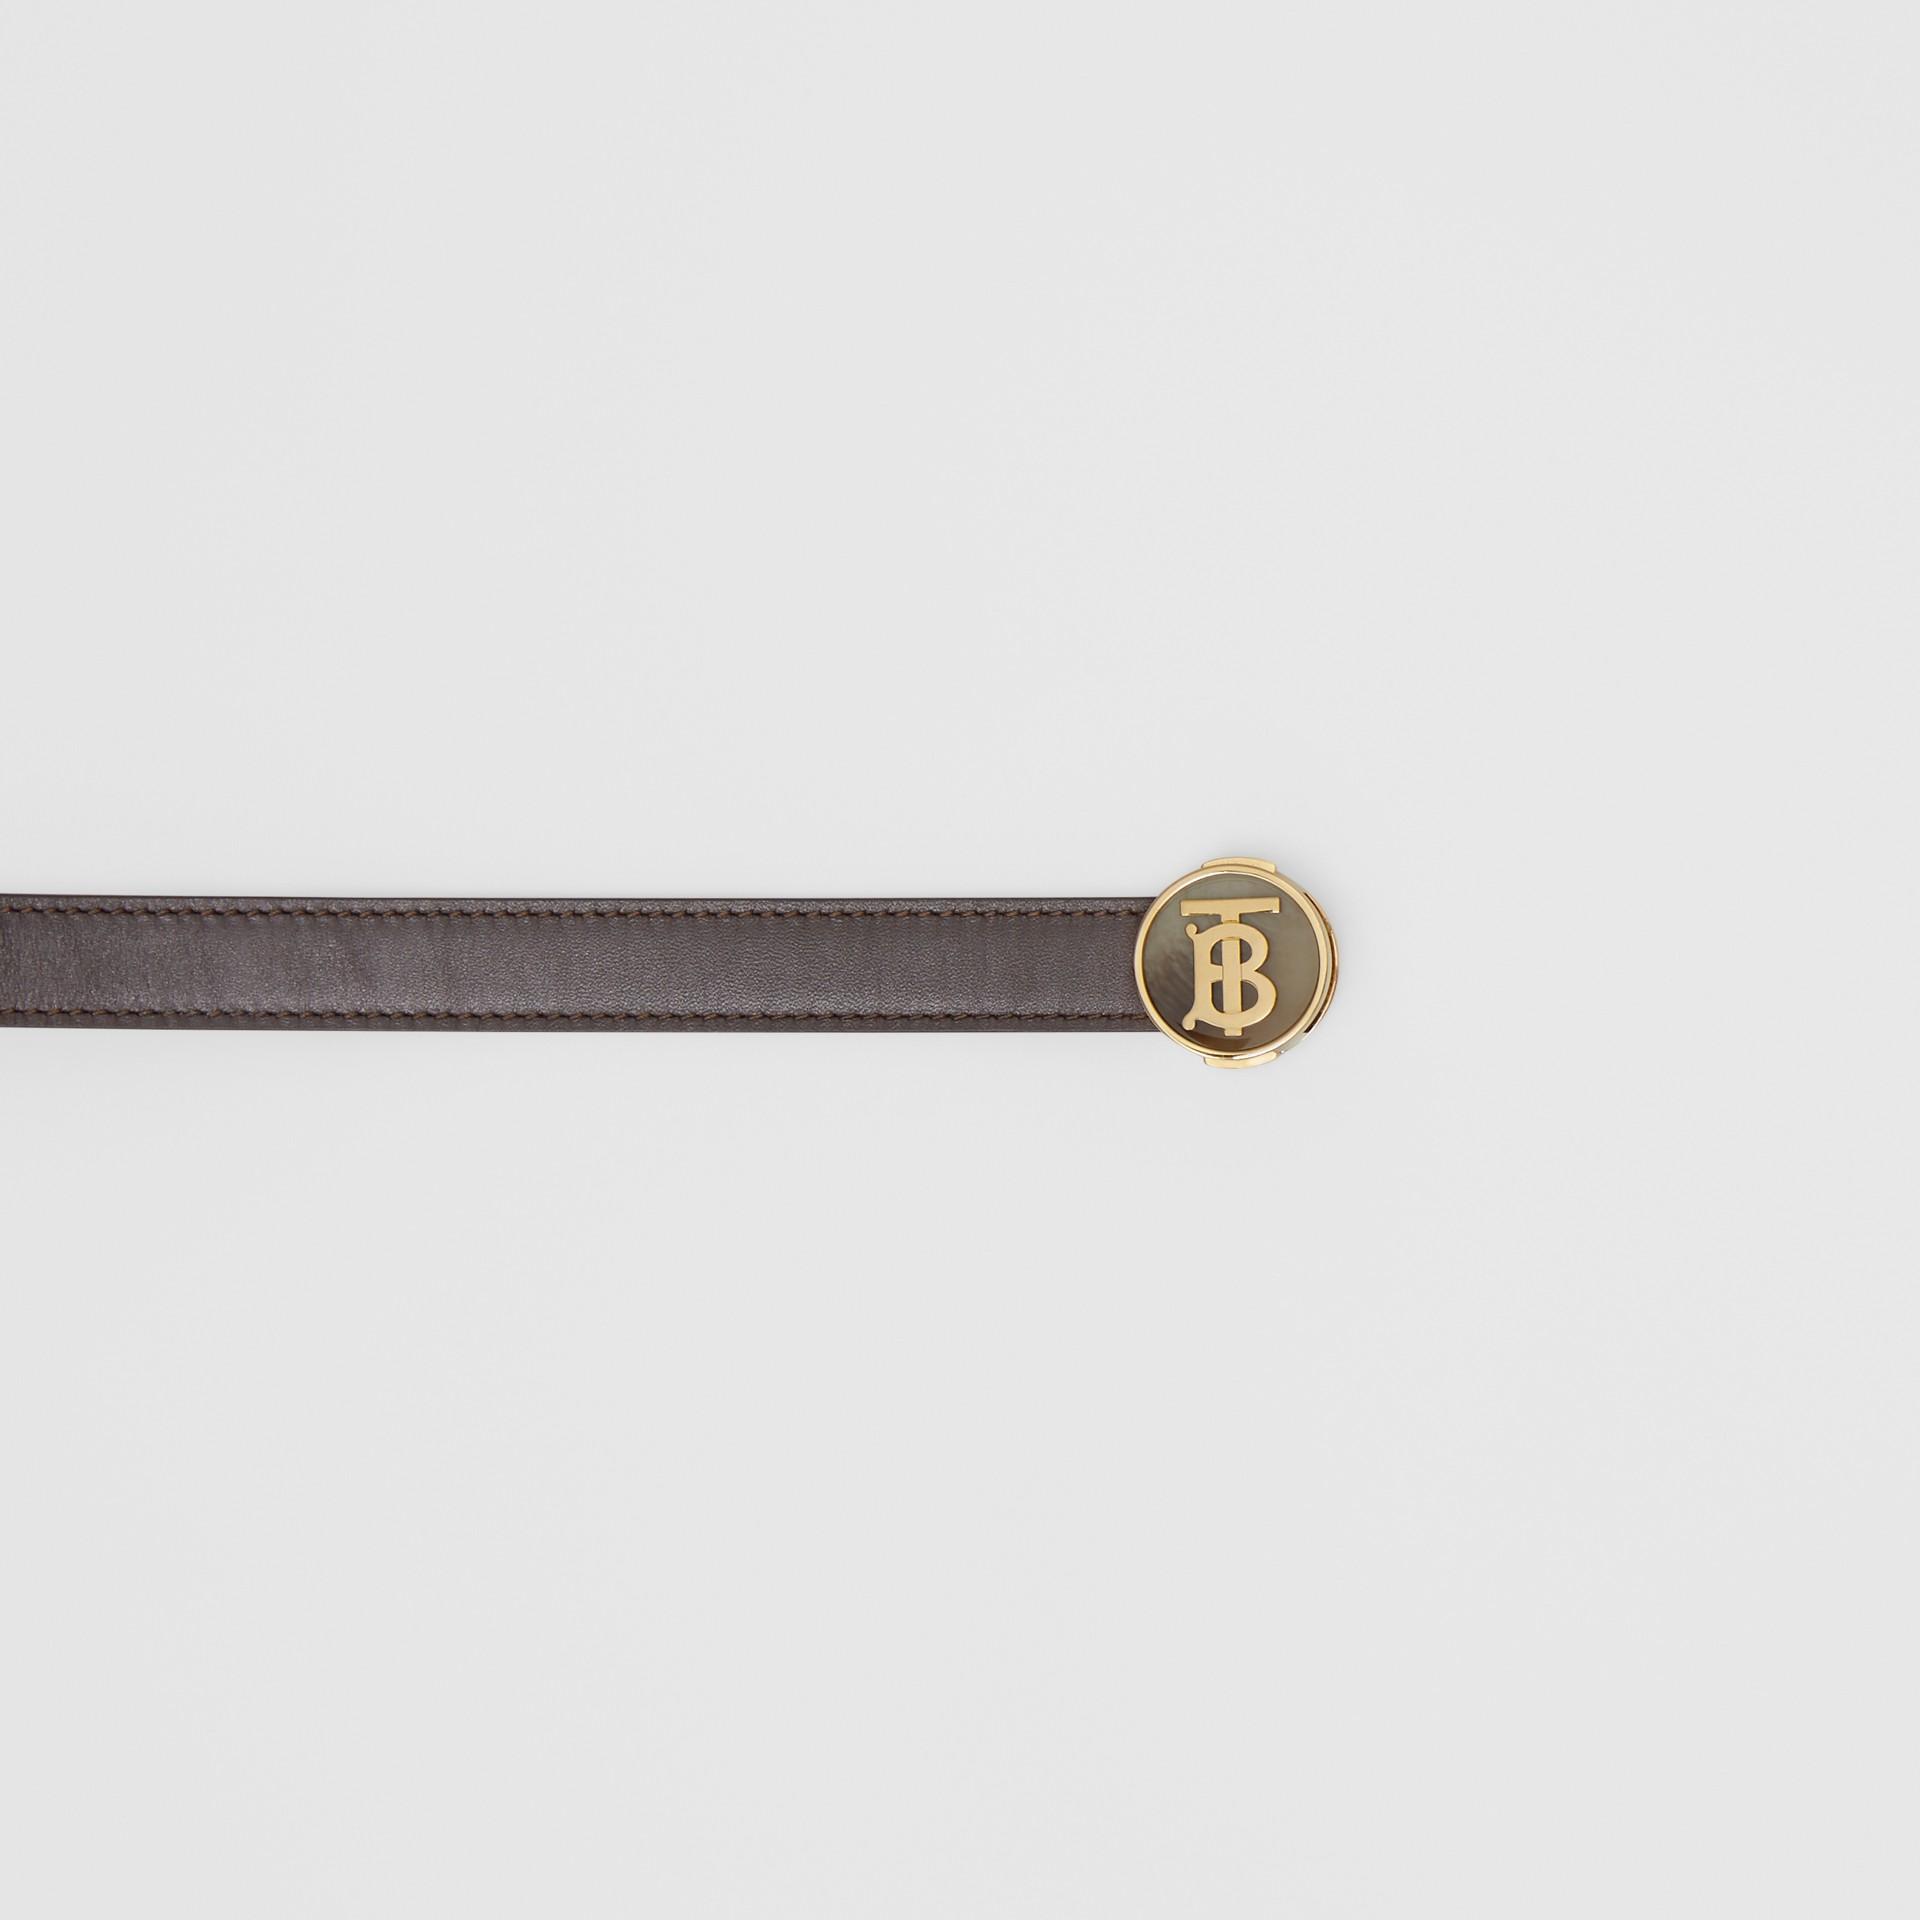 Ceinture en cuir Monogram (Brun Intense) - Femme | Burberry - photo de la galerie 1